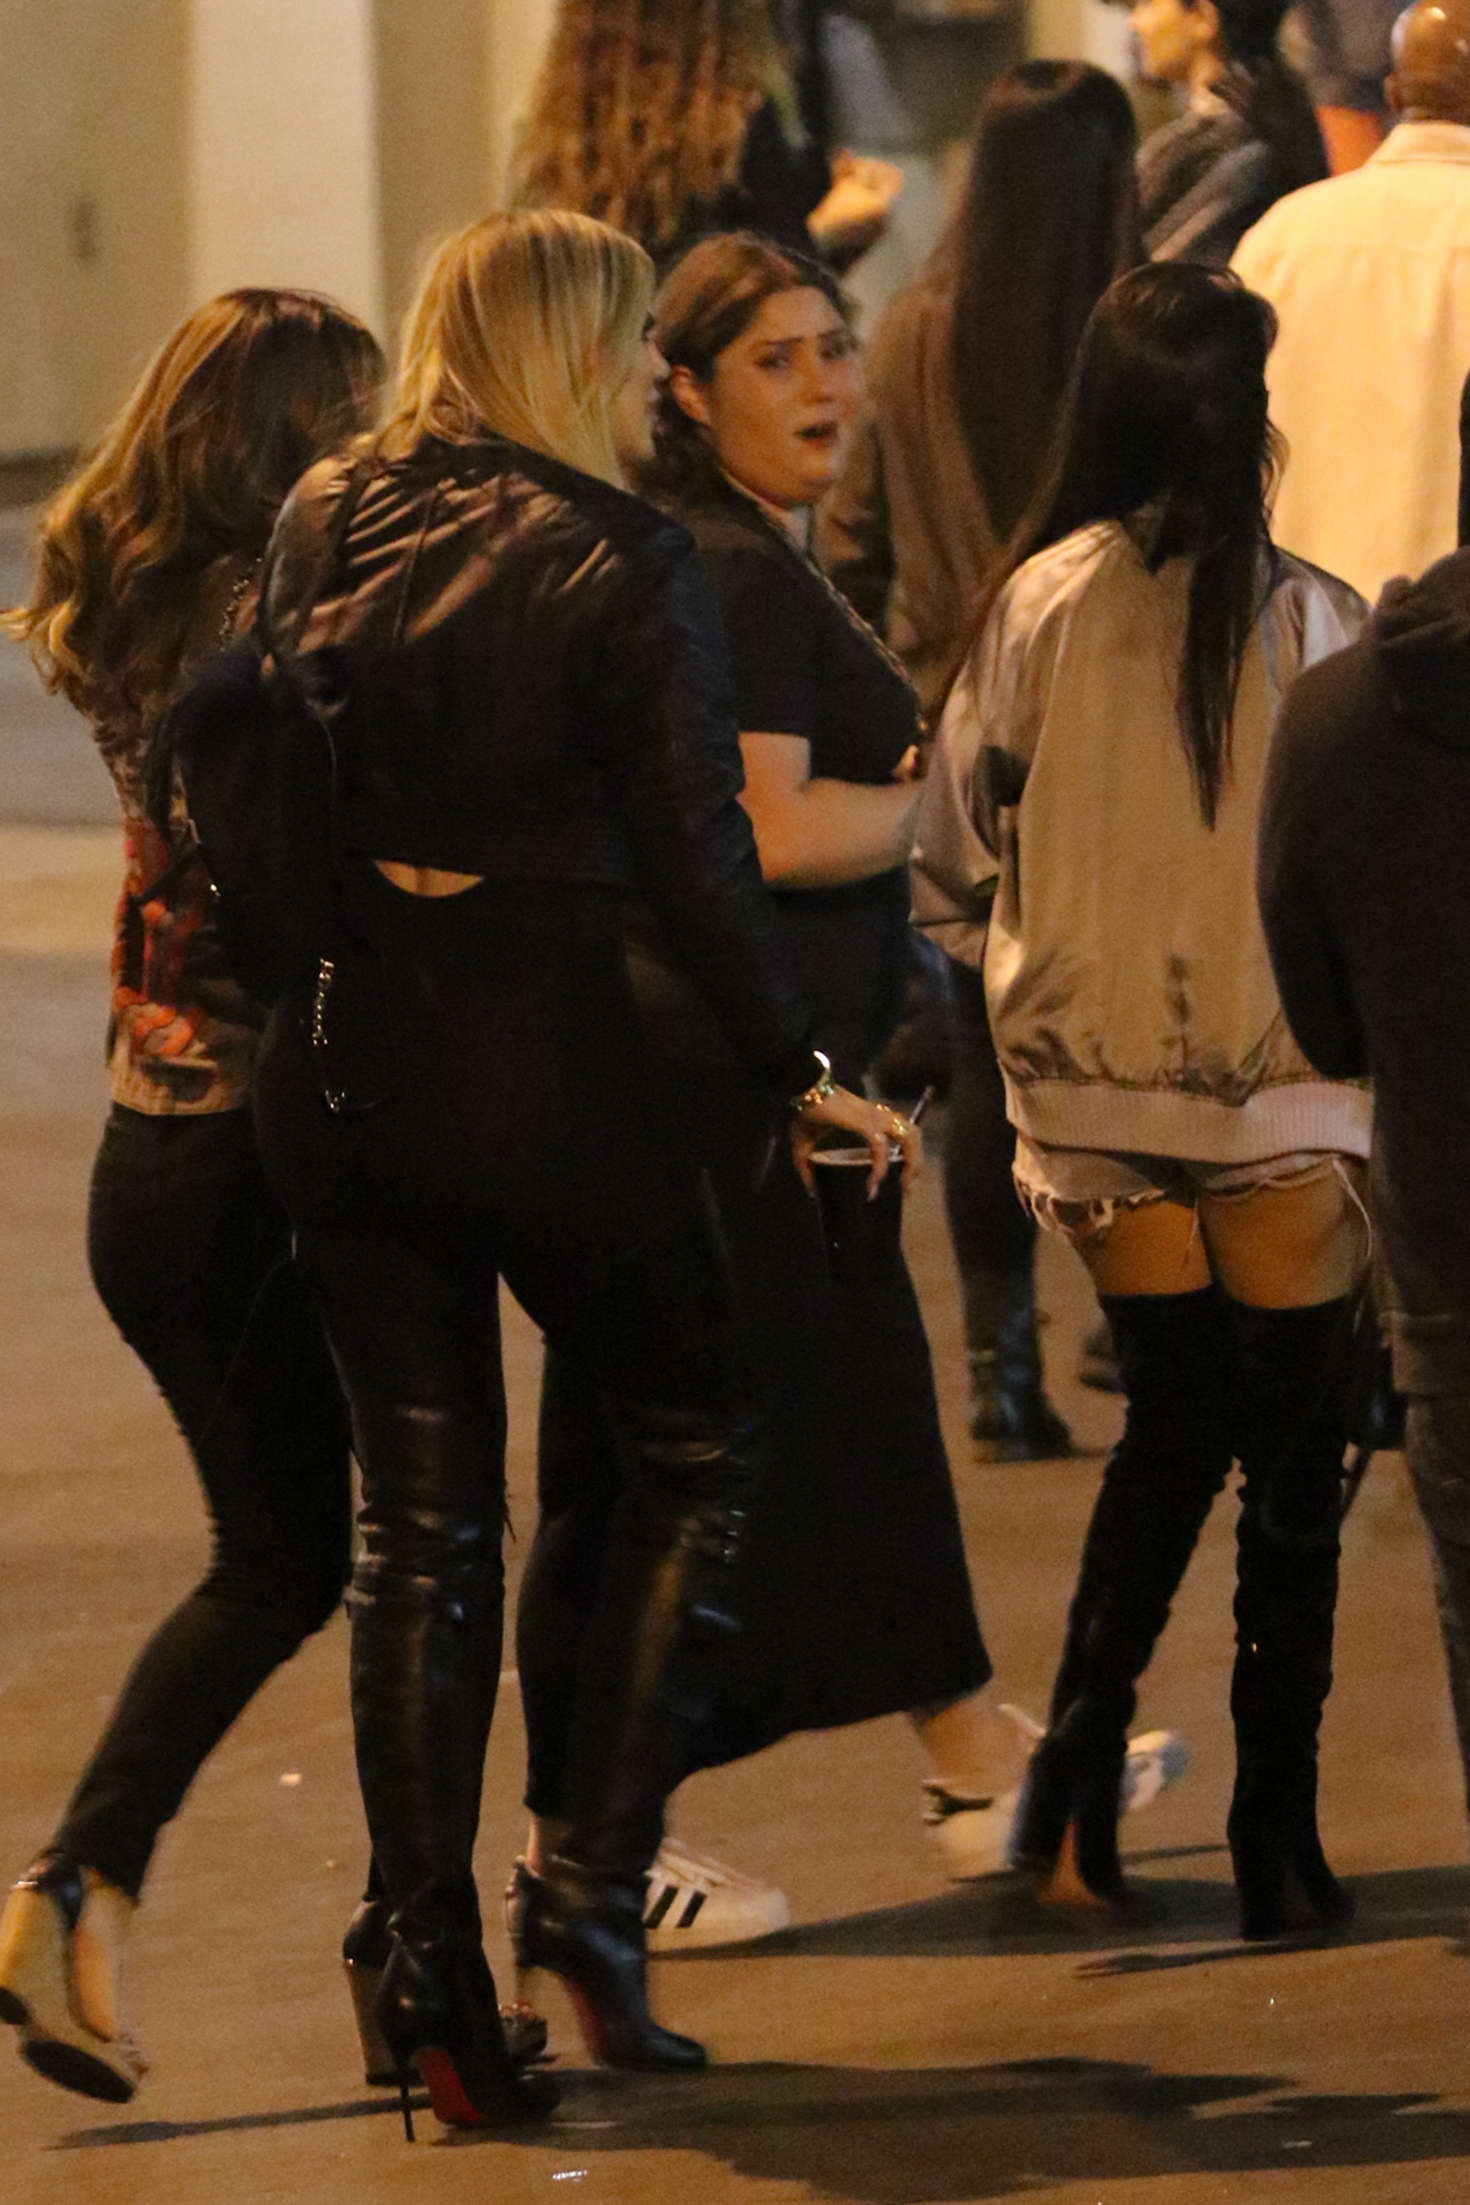 Khloe Kardashian 2016 : Khloe Kardashian at Beyonce Concert -03